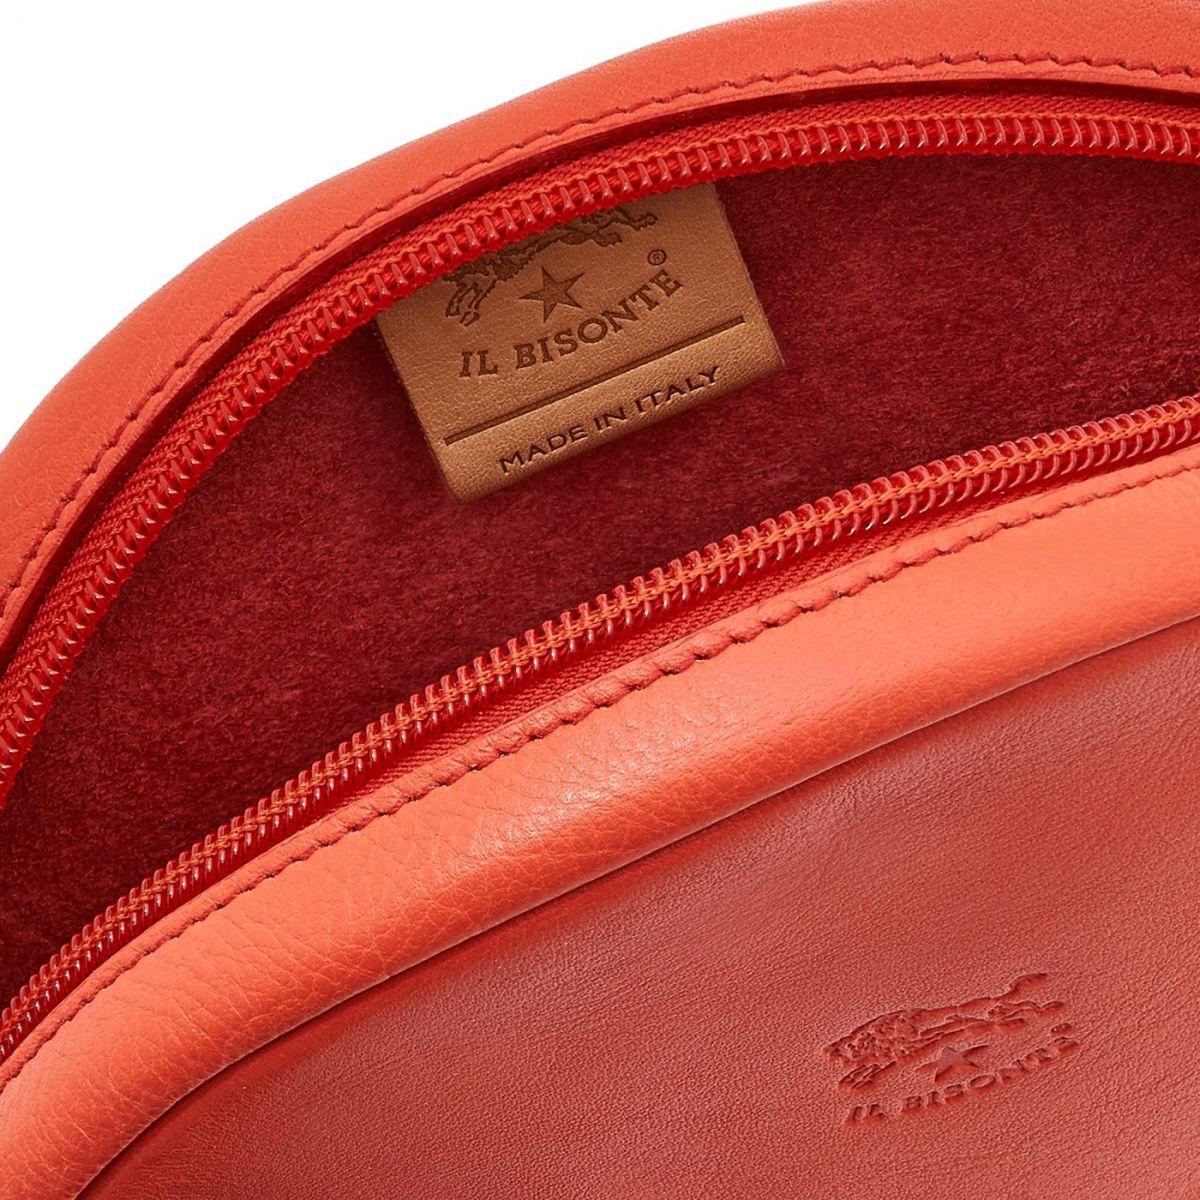 Women's Crossbody Bag Elisa in Cowhide Leather BCR159 color Gazpacho | Details